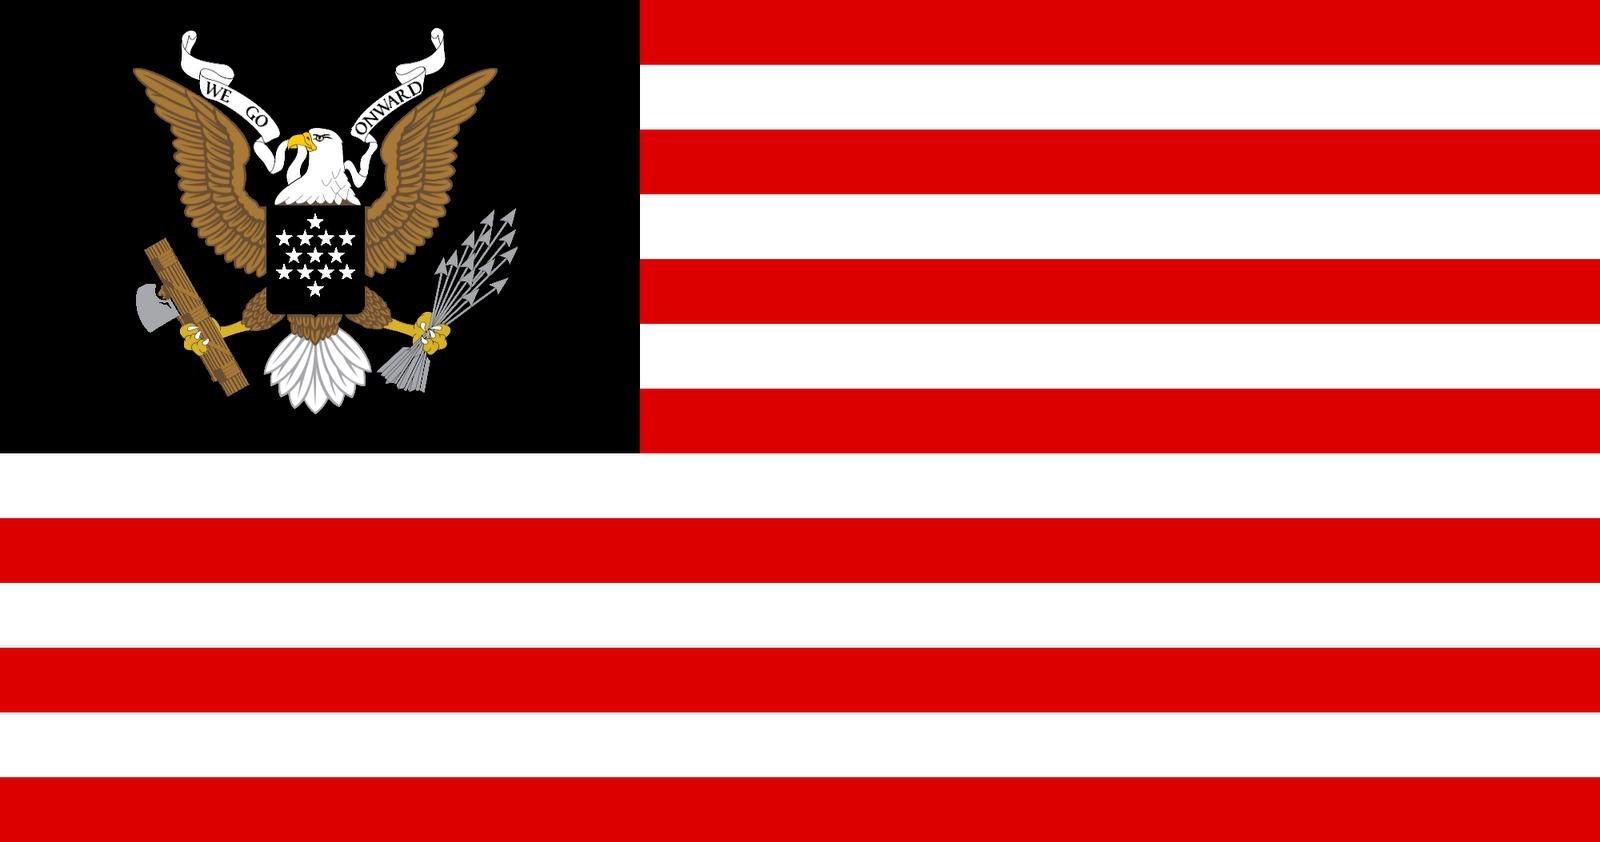 Henry A. Wallace, American fascism, Donald Trump, corporatism, fascist state, Trump lies, Trump demagoguery